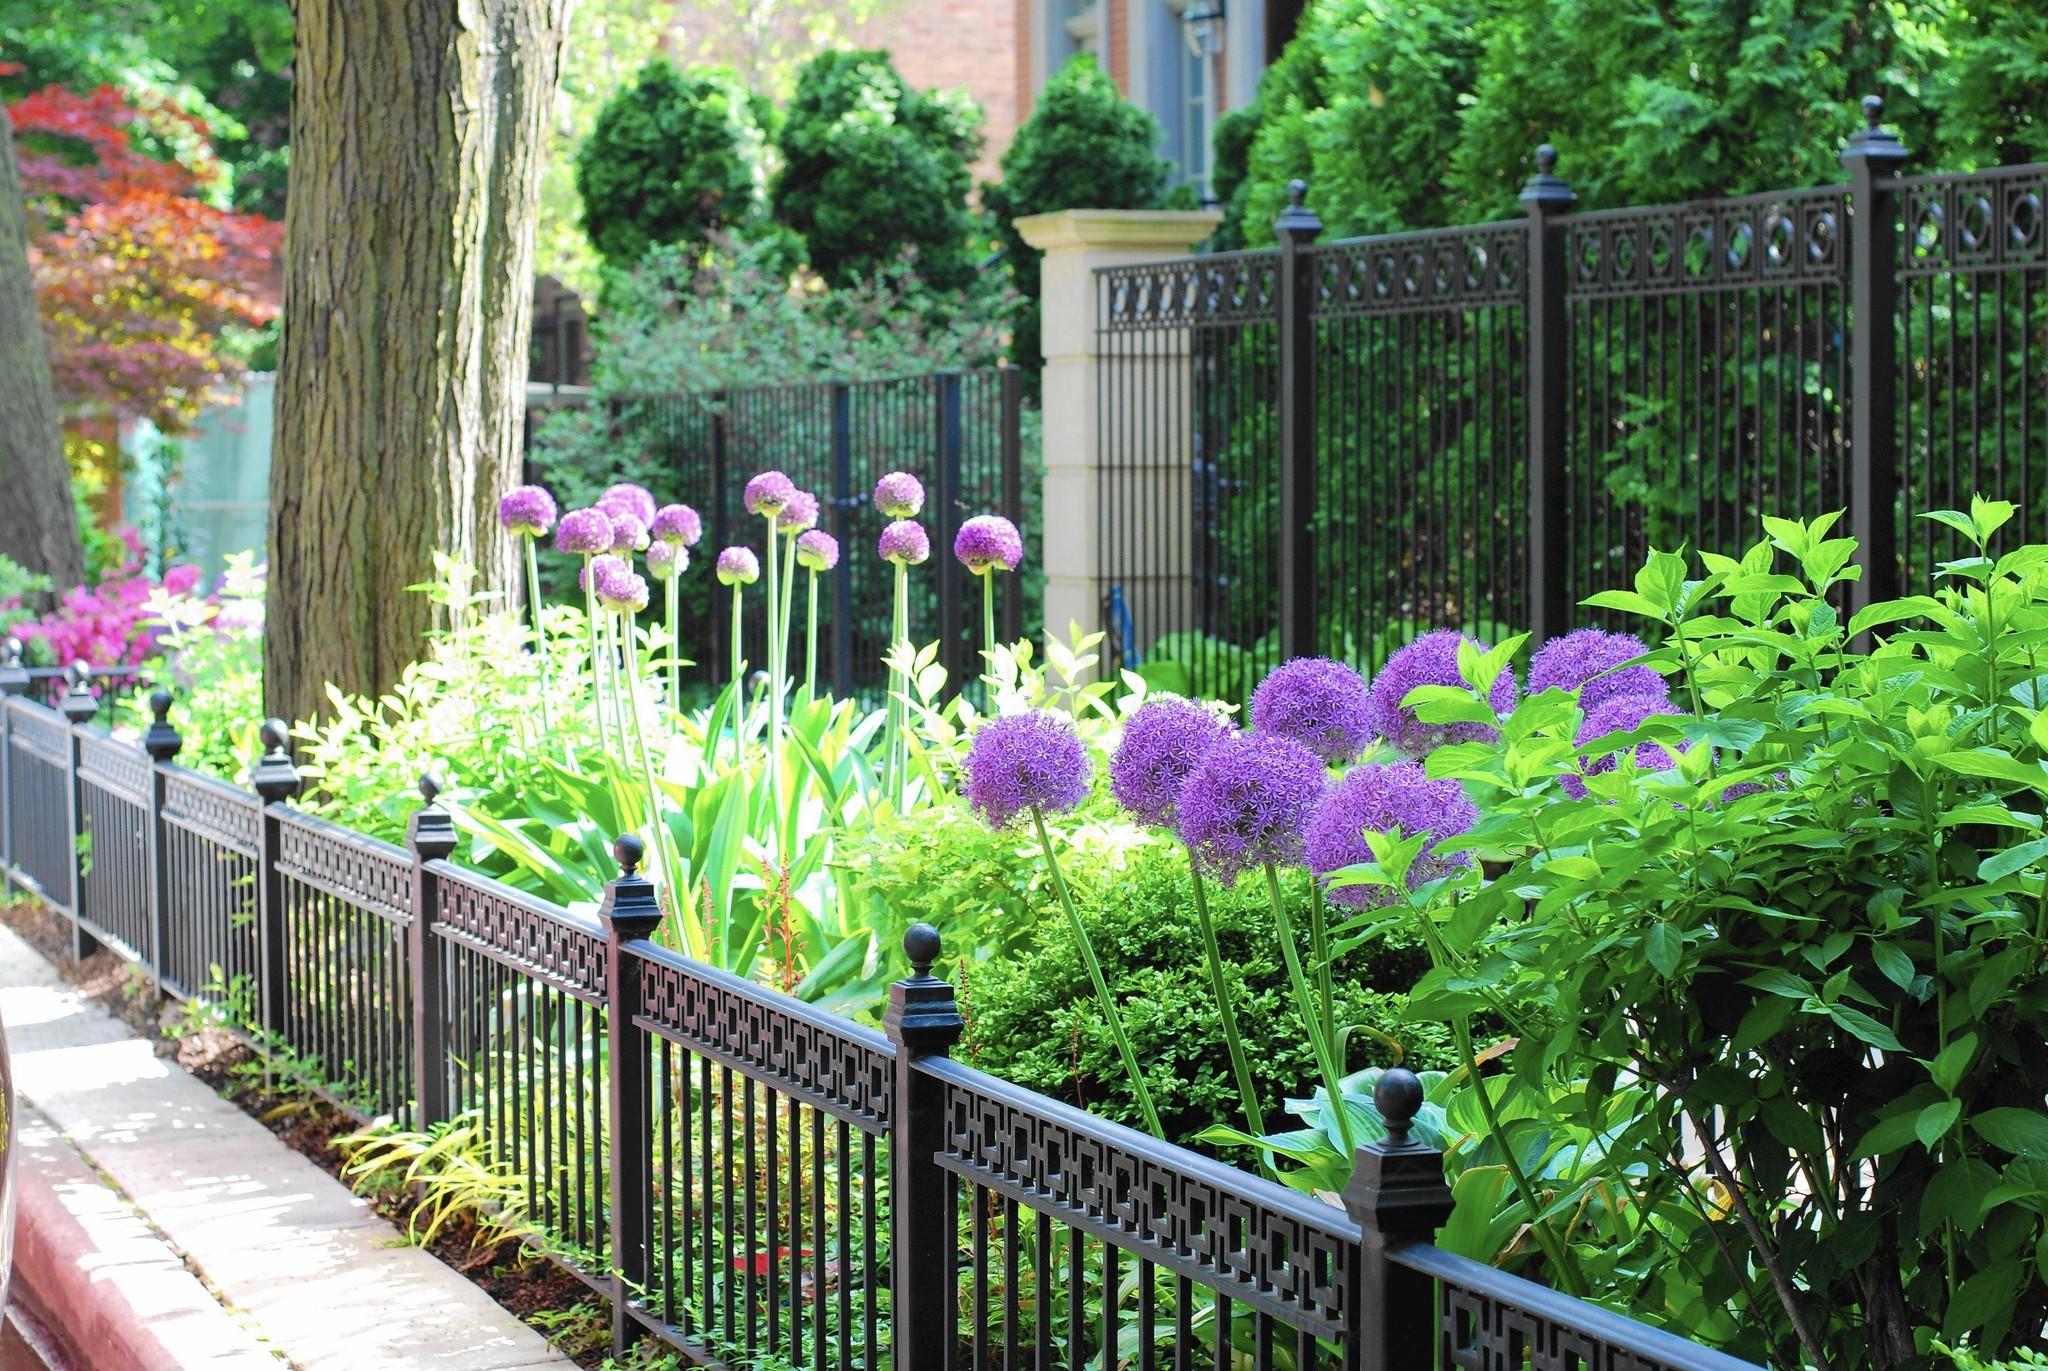 How to make over your parkway garden - Chicago Tribune Zone Garden Border Designs Html on backyard design zone 6, garden design zone 8, rock garden plants zone 6, garden design zone 4, rain garden plants zone 6, garden design zone 9,